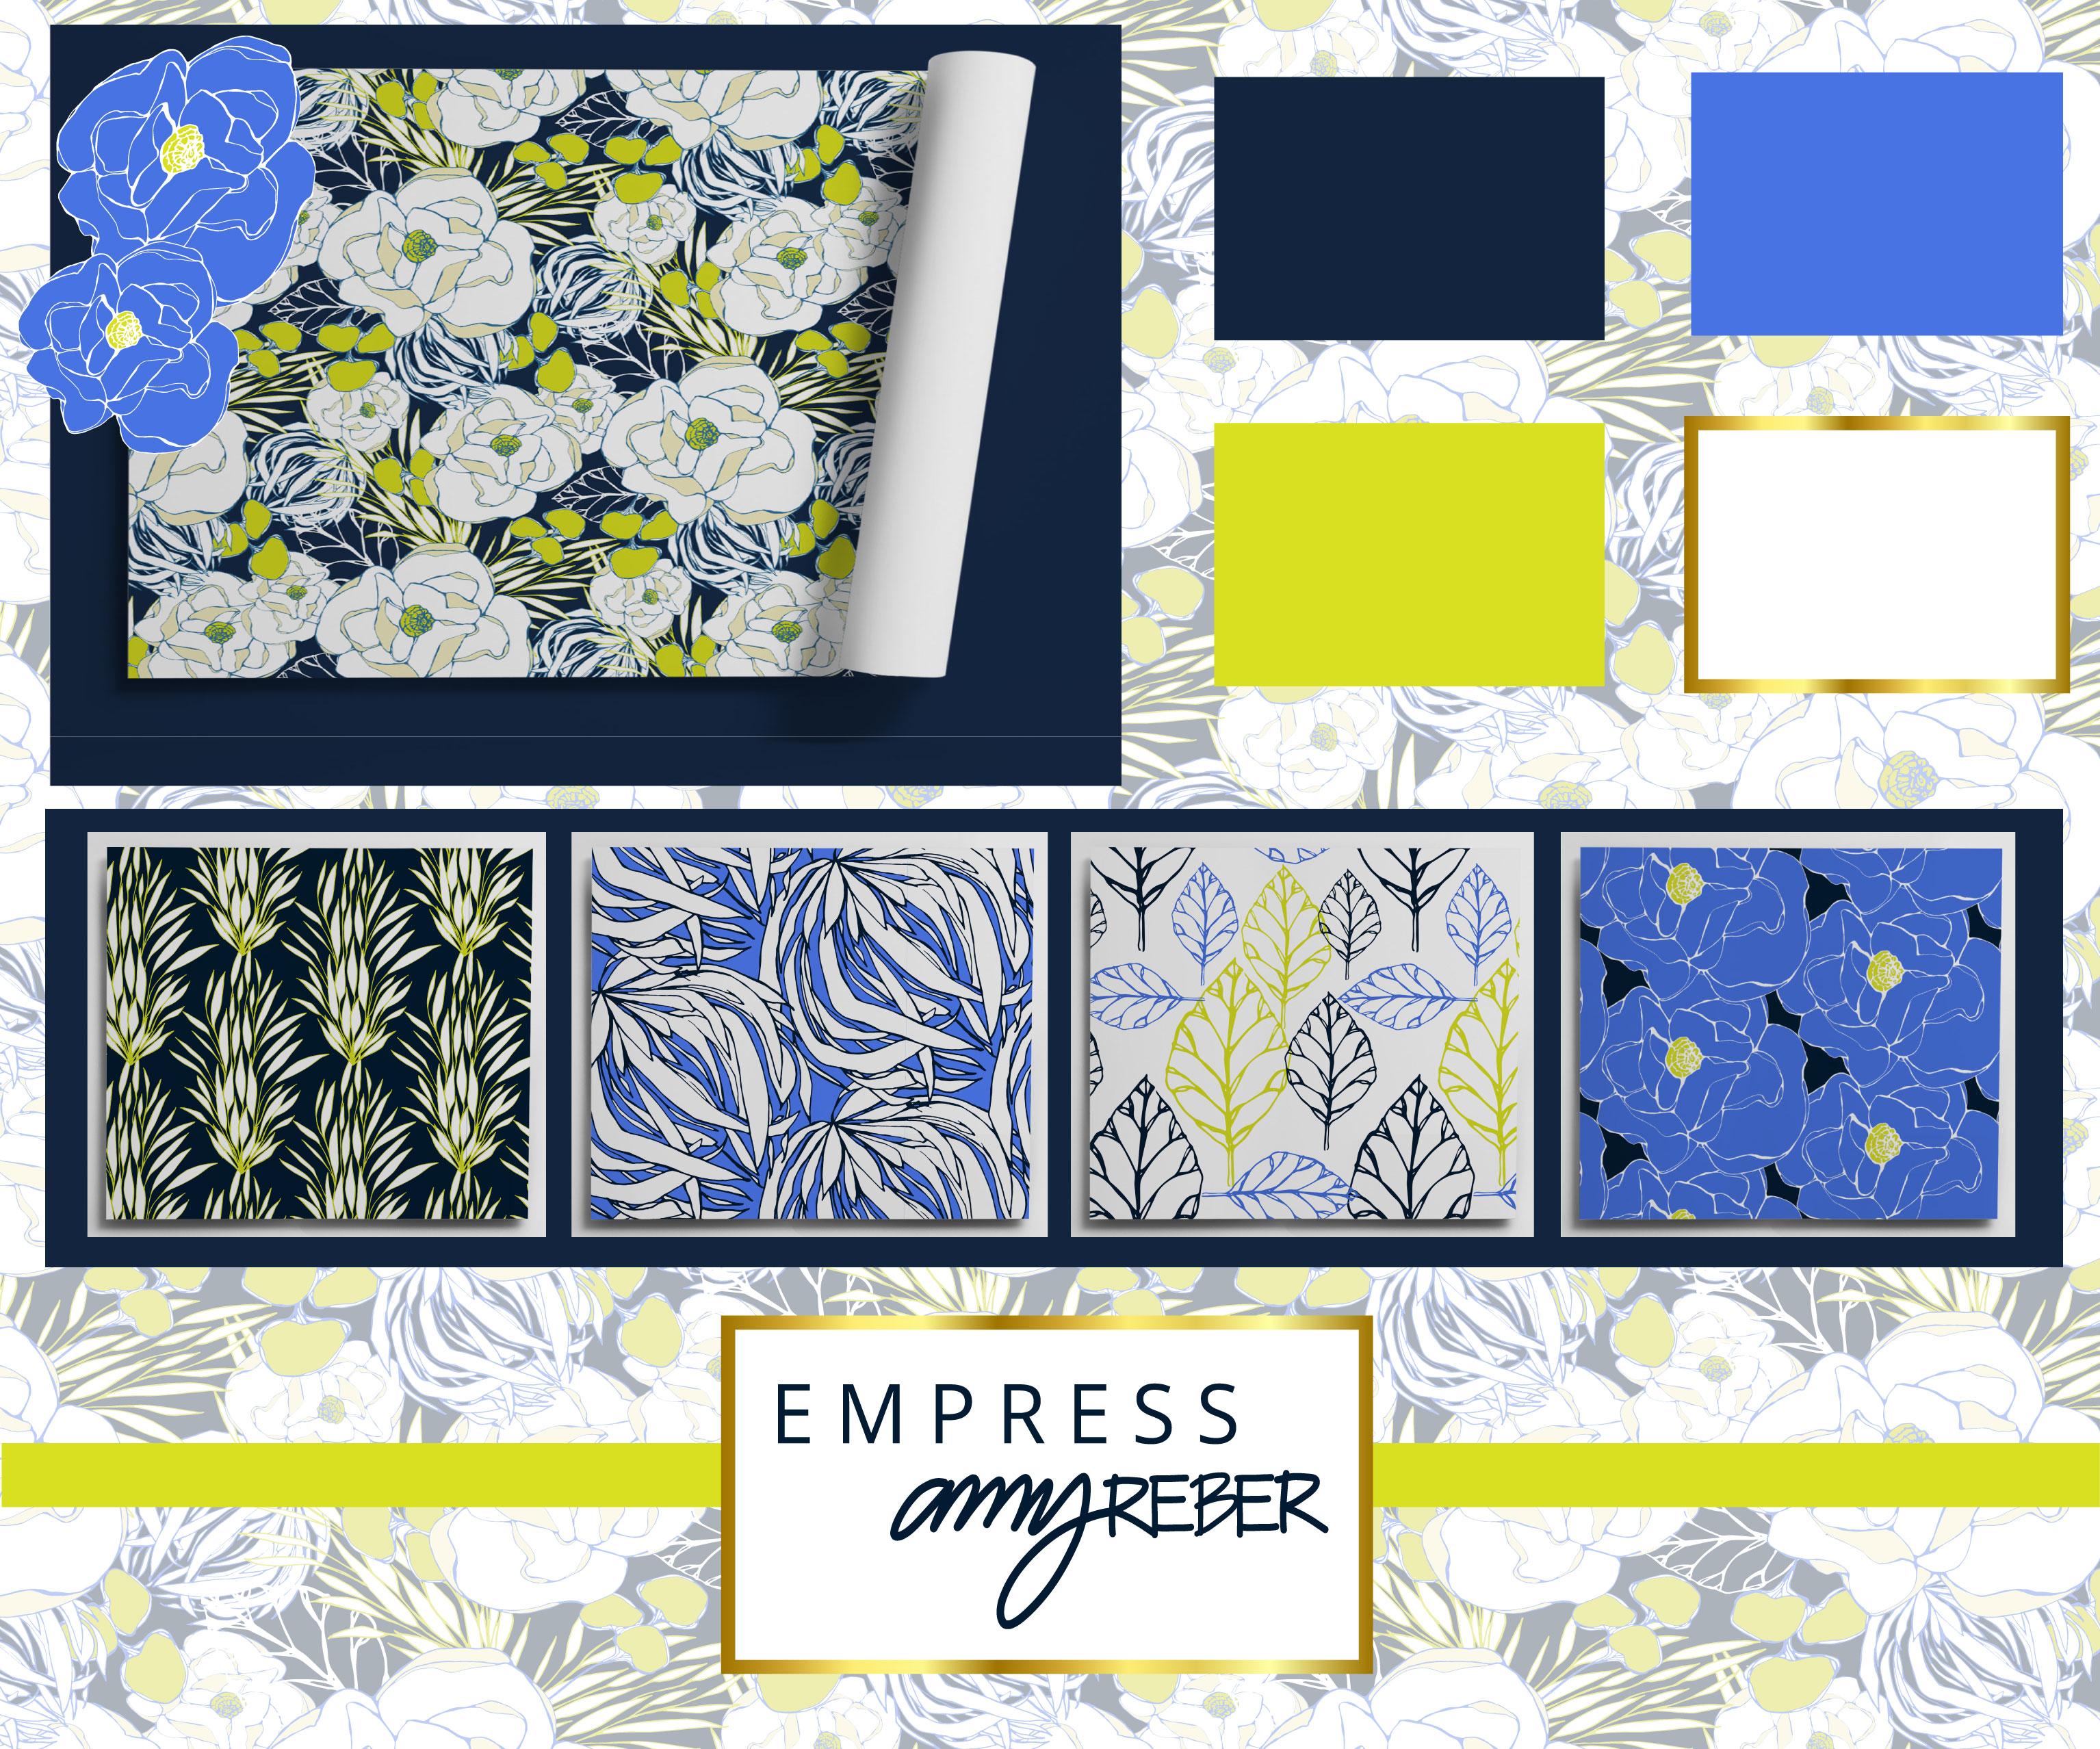 empress-wallpaper